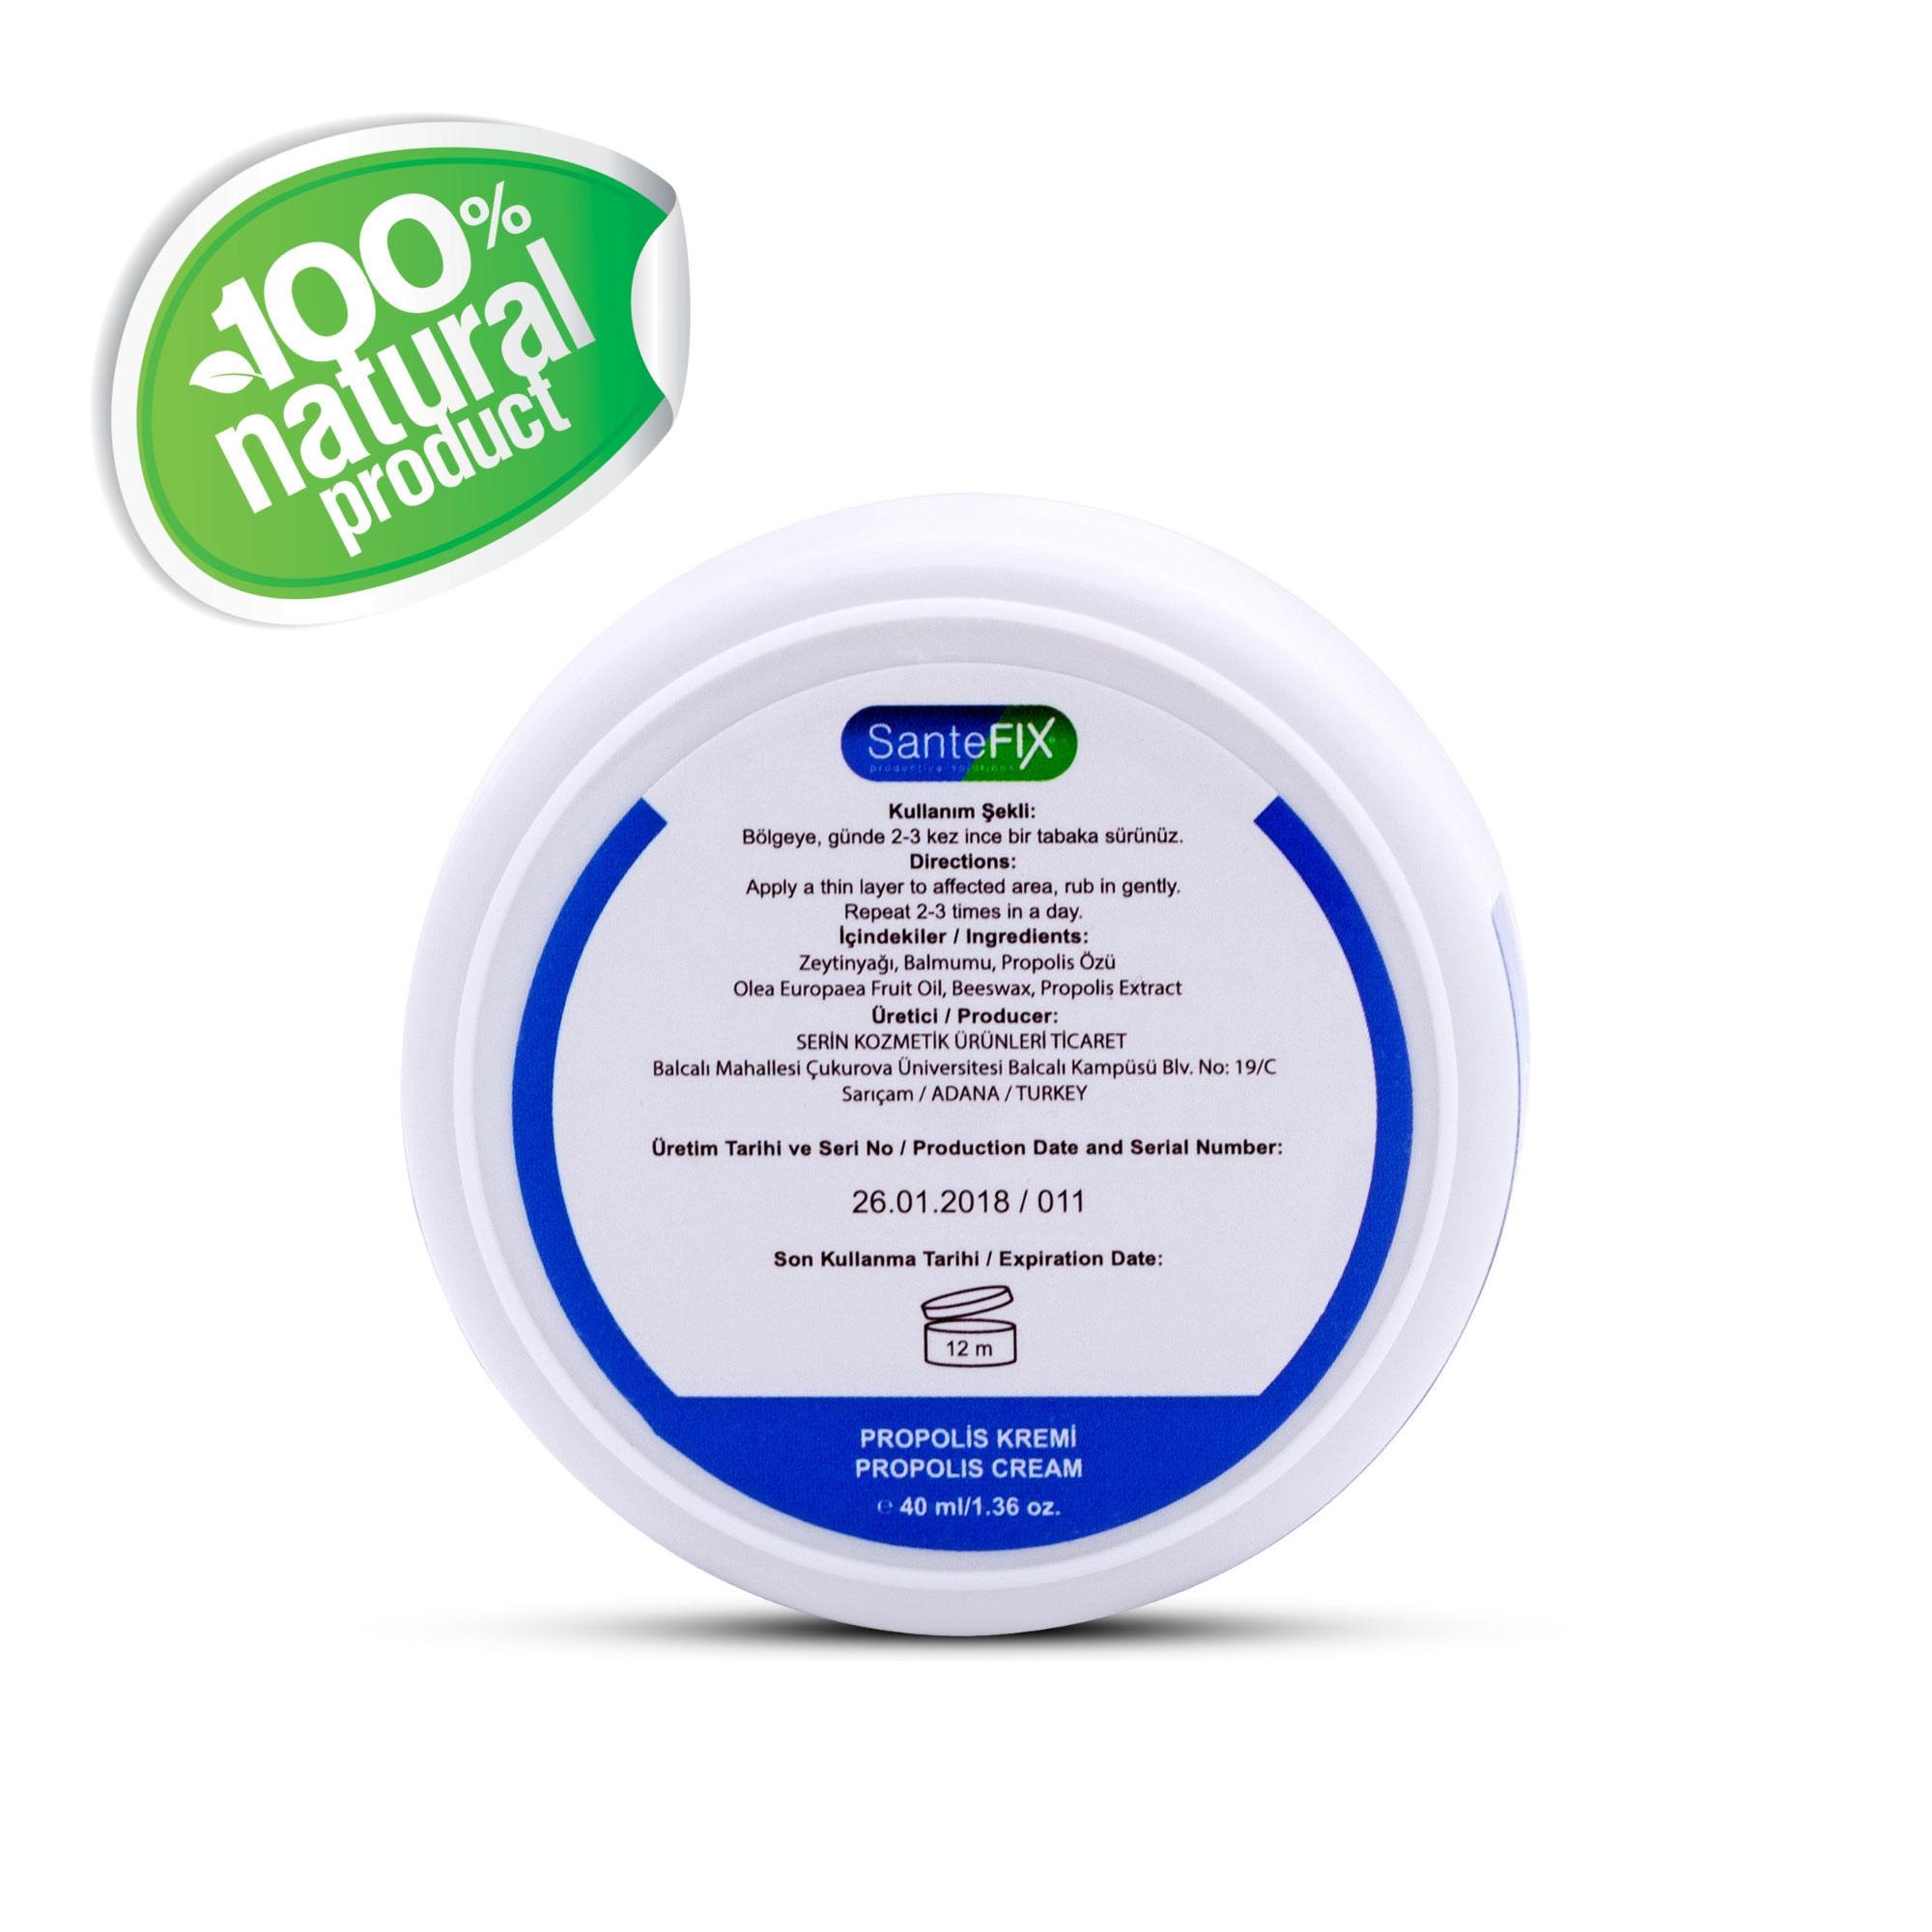 SanteFIX Propolis Cream